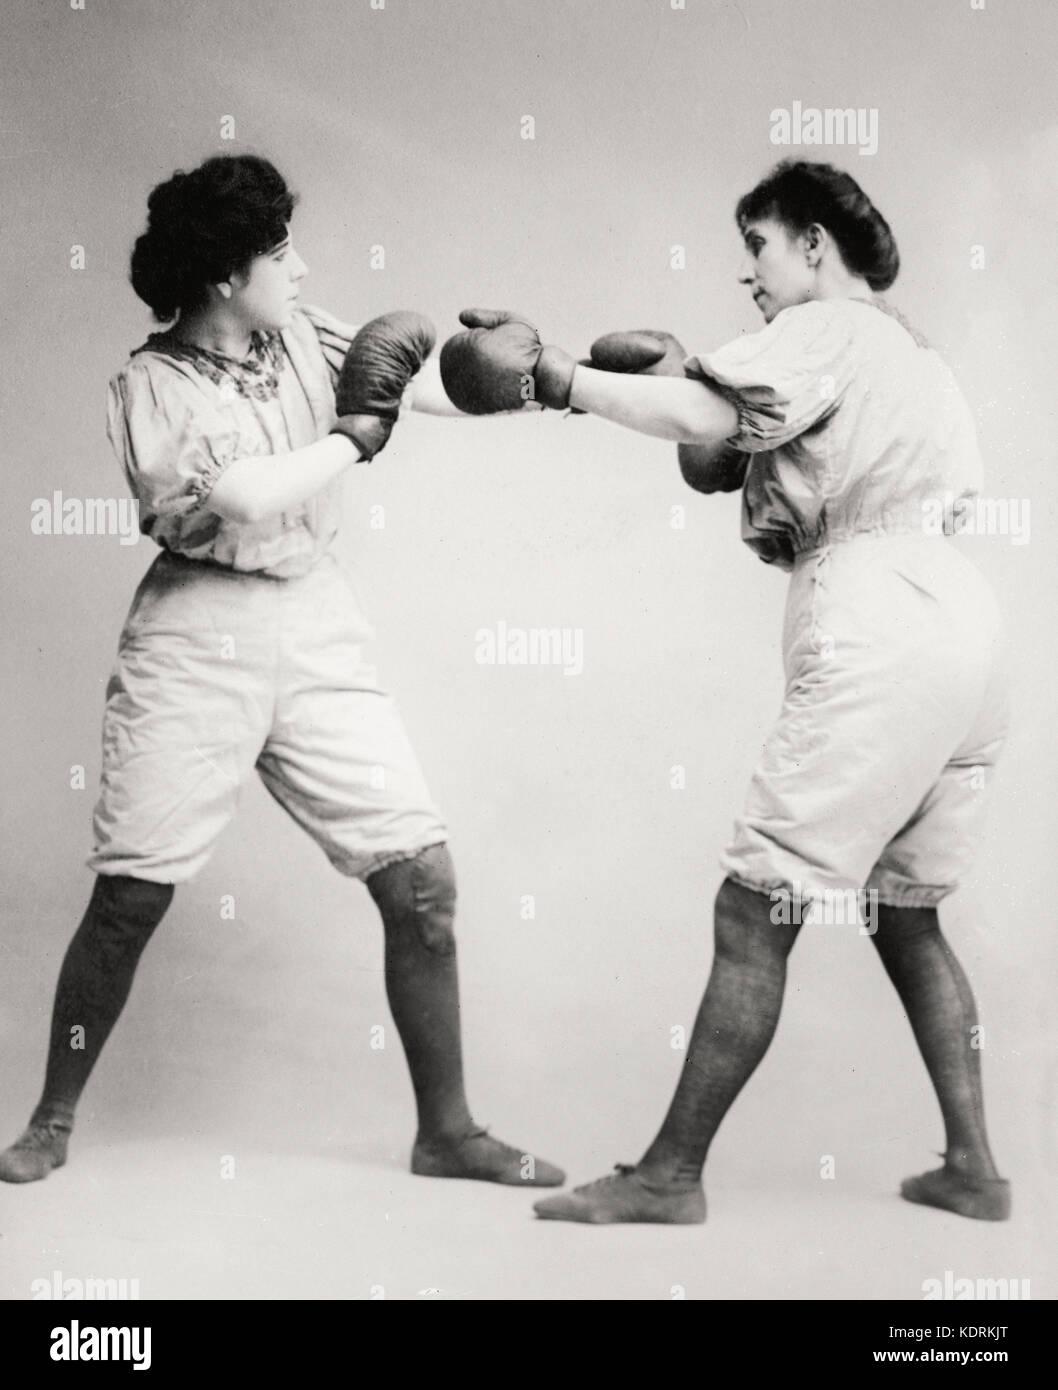 Hermanas Bennet boxeo, circa 1910 Imagen De Stock